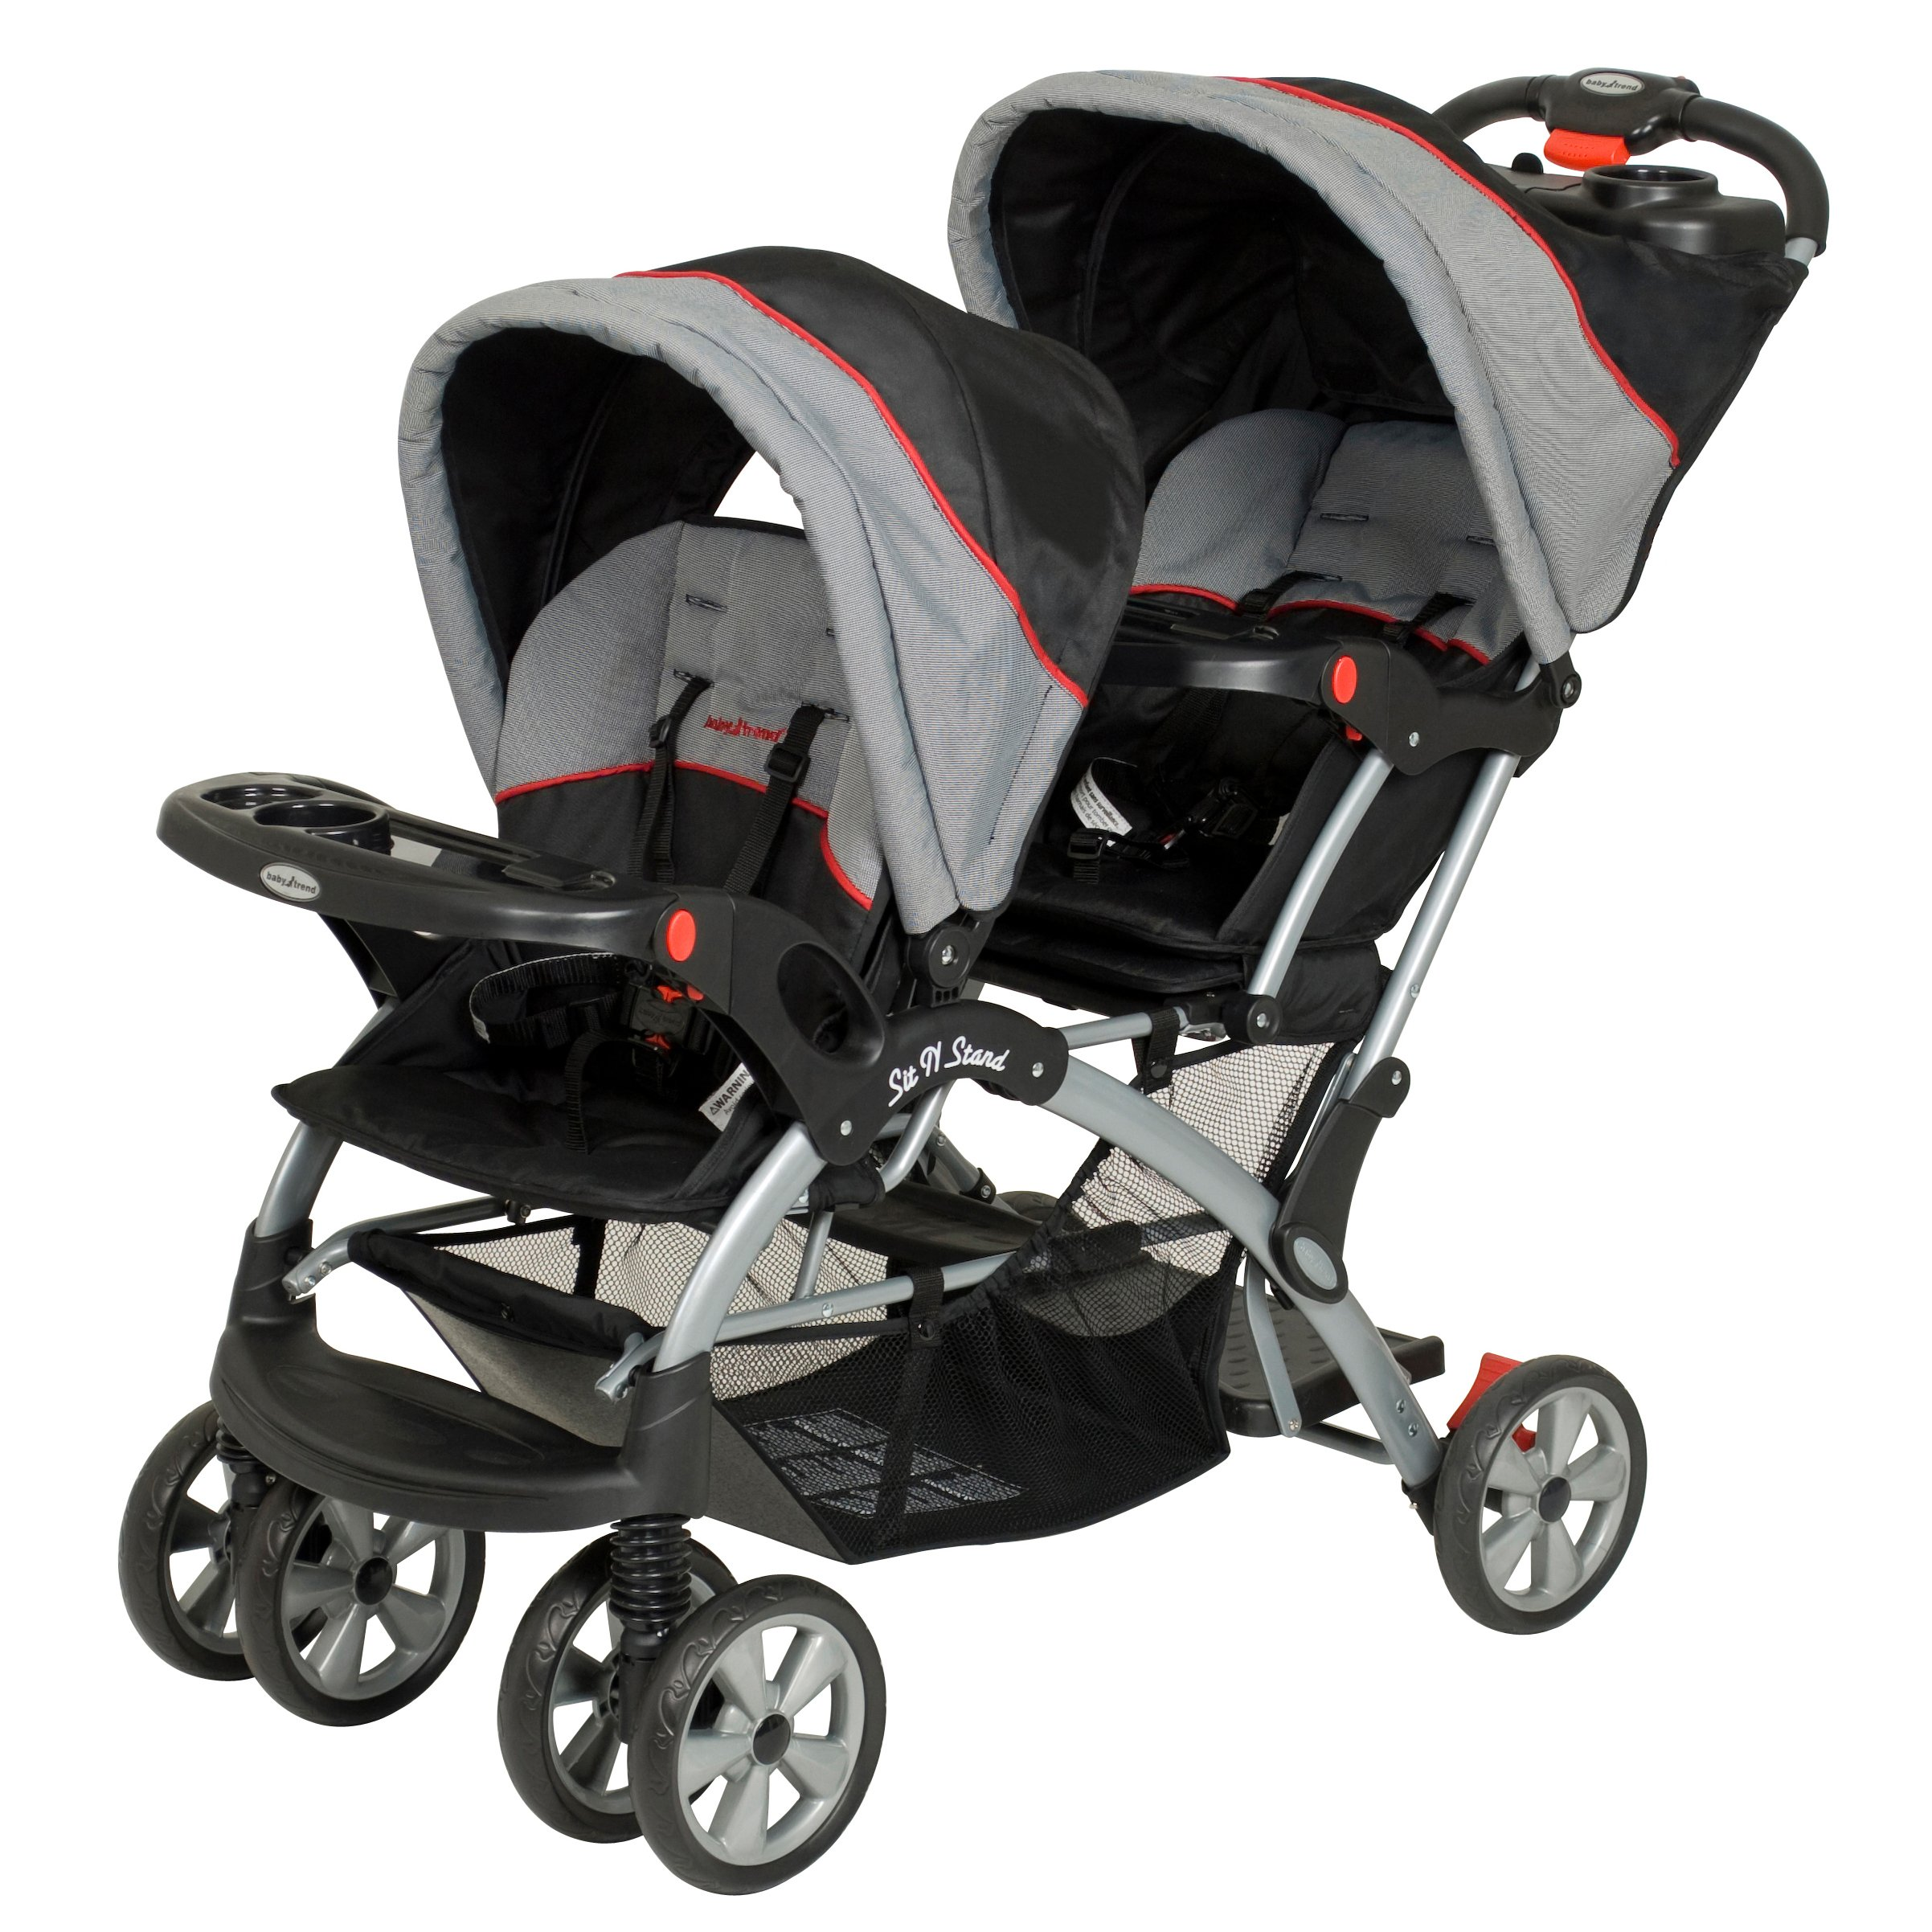 Baby Trend Double Sit N Stand Stroller Millennium